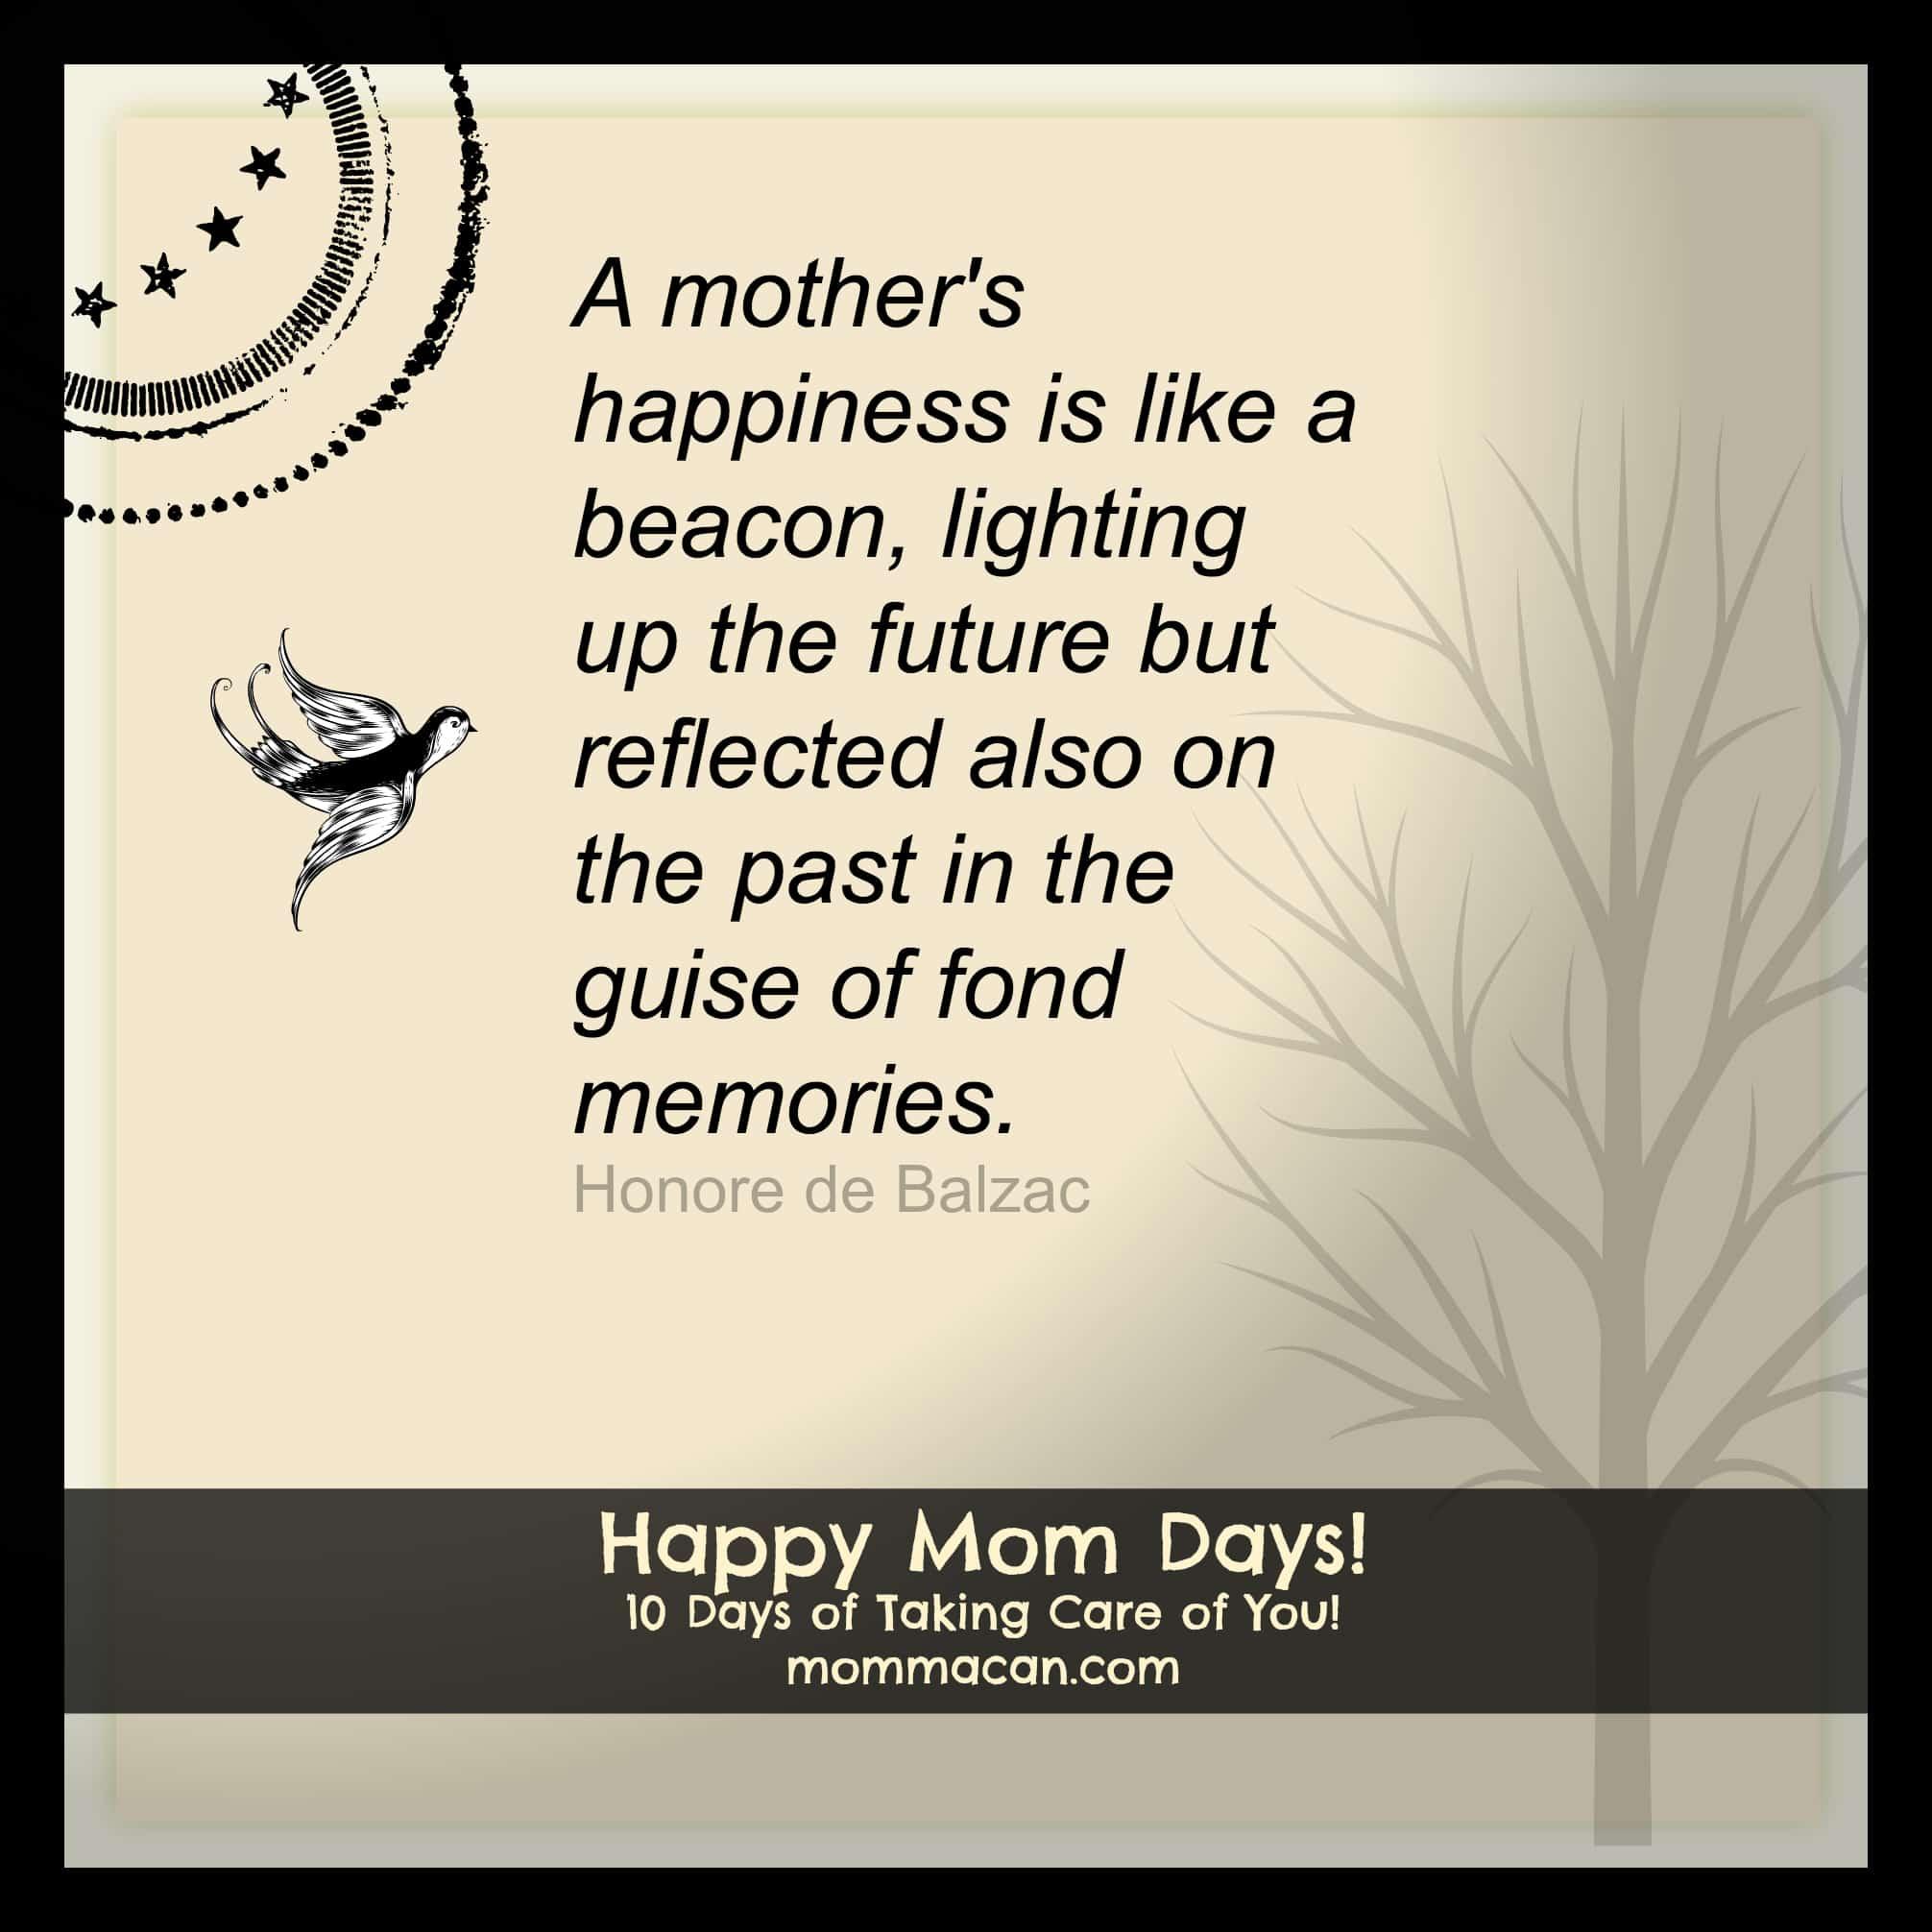 Happy Mom Days!